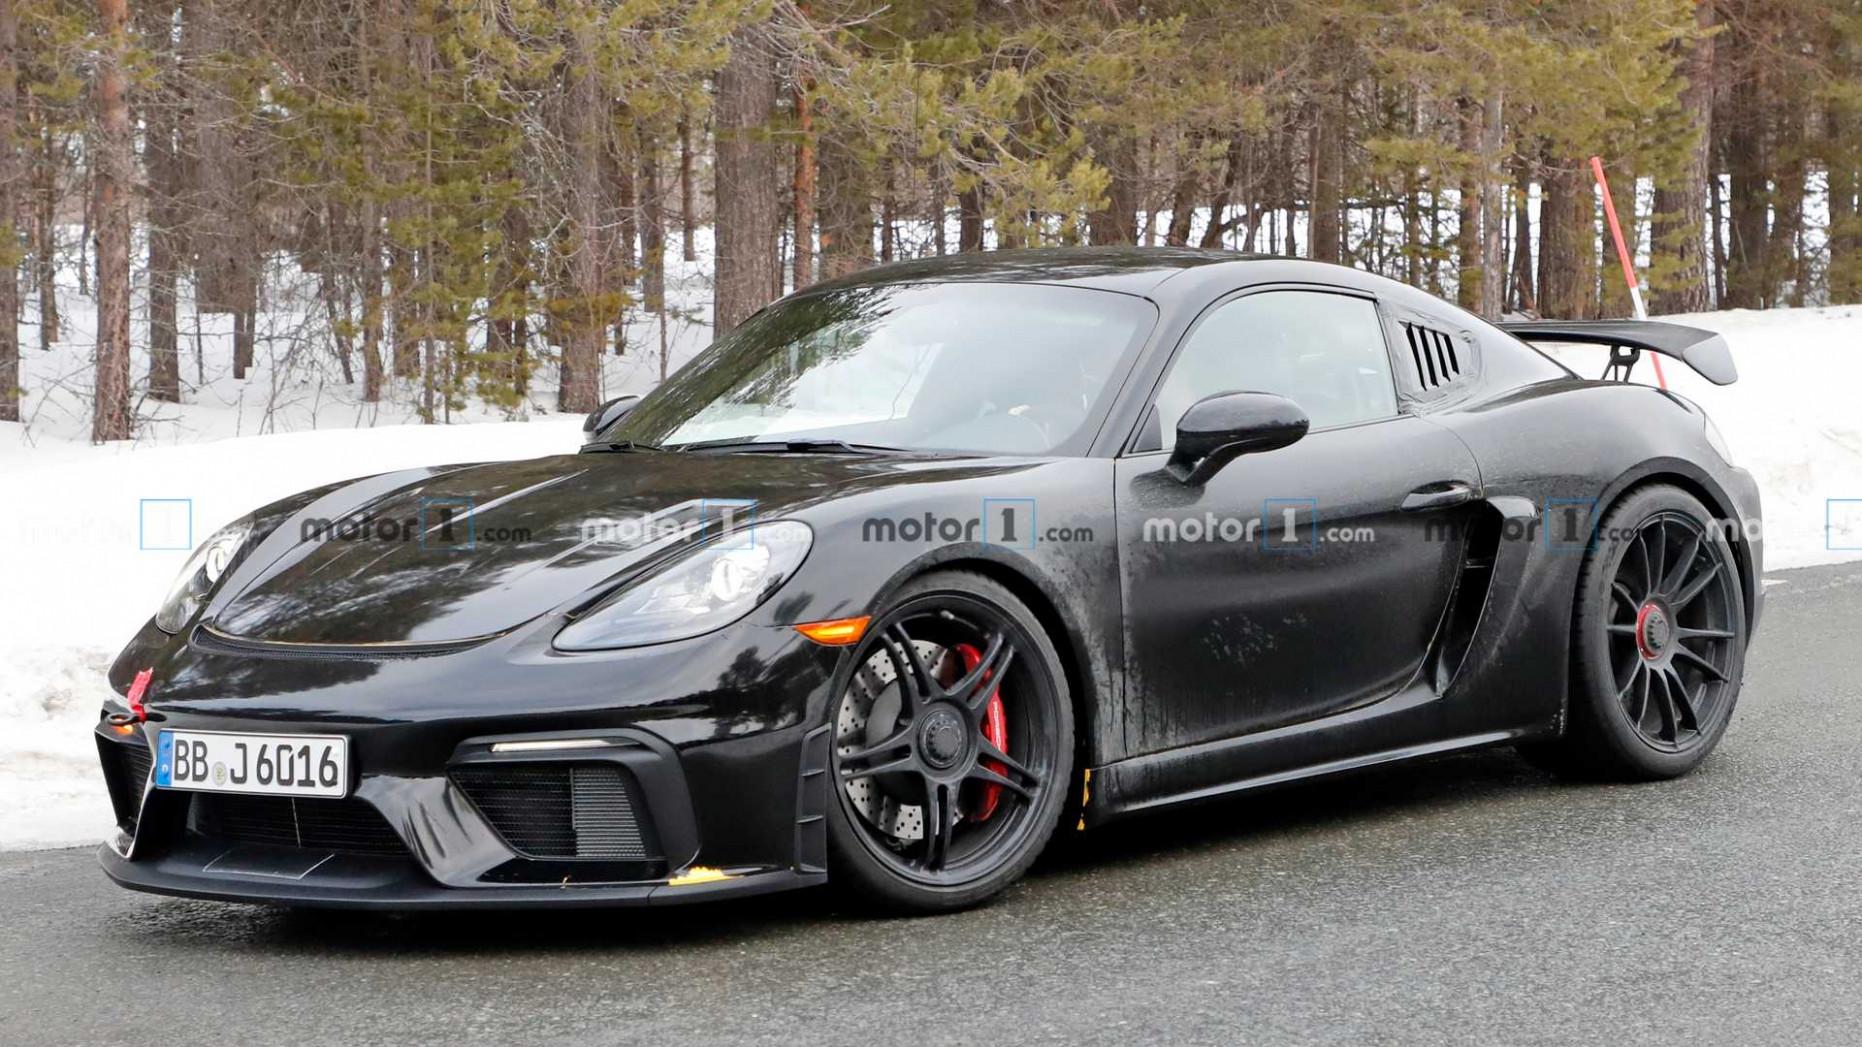 Redesign and Review 2022 Porsche 718